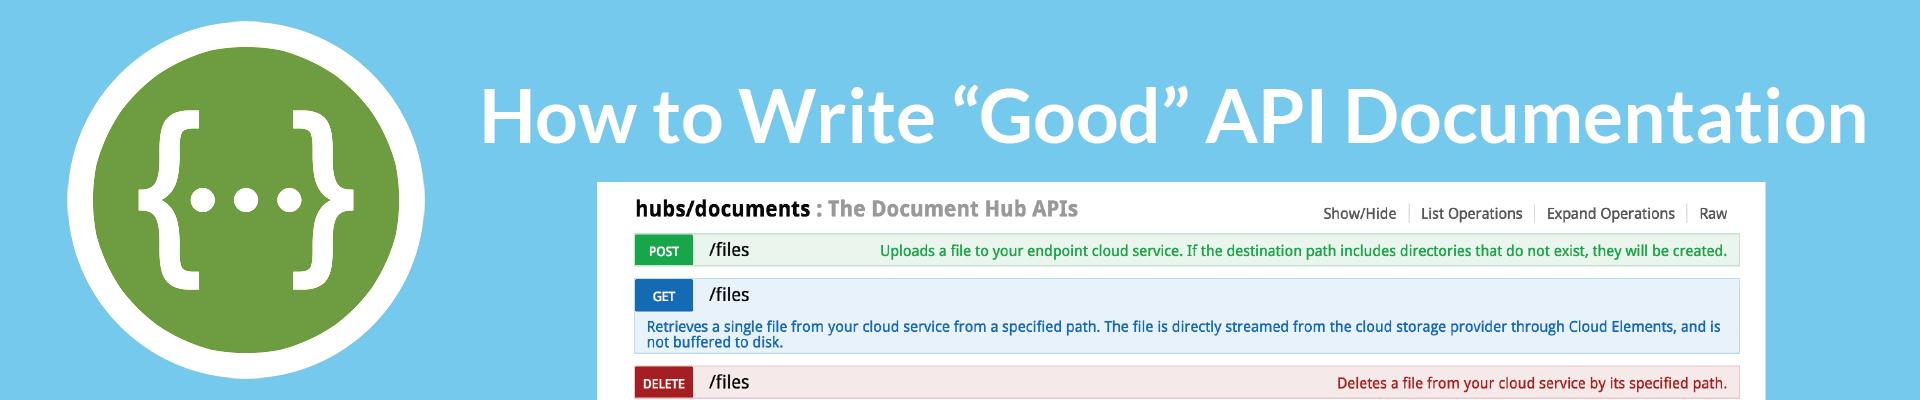 Good API Documentation